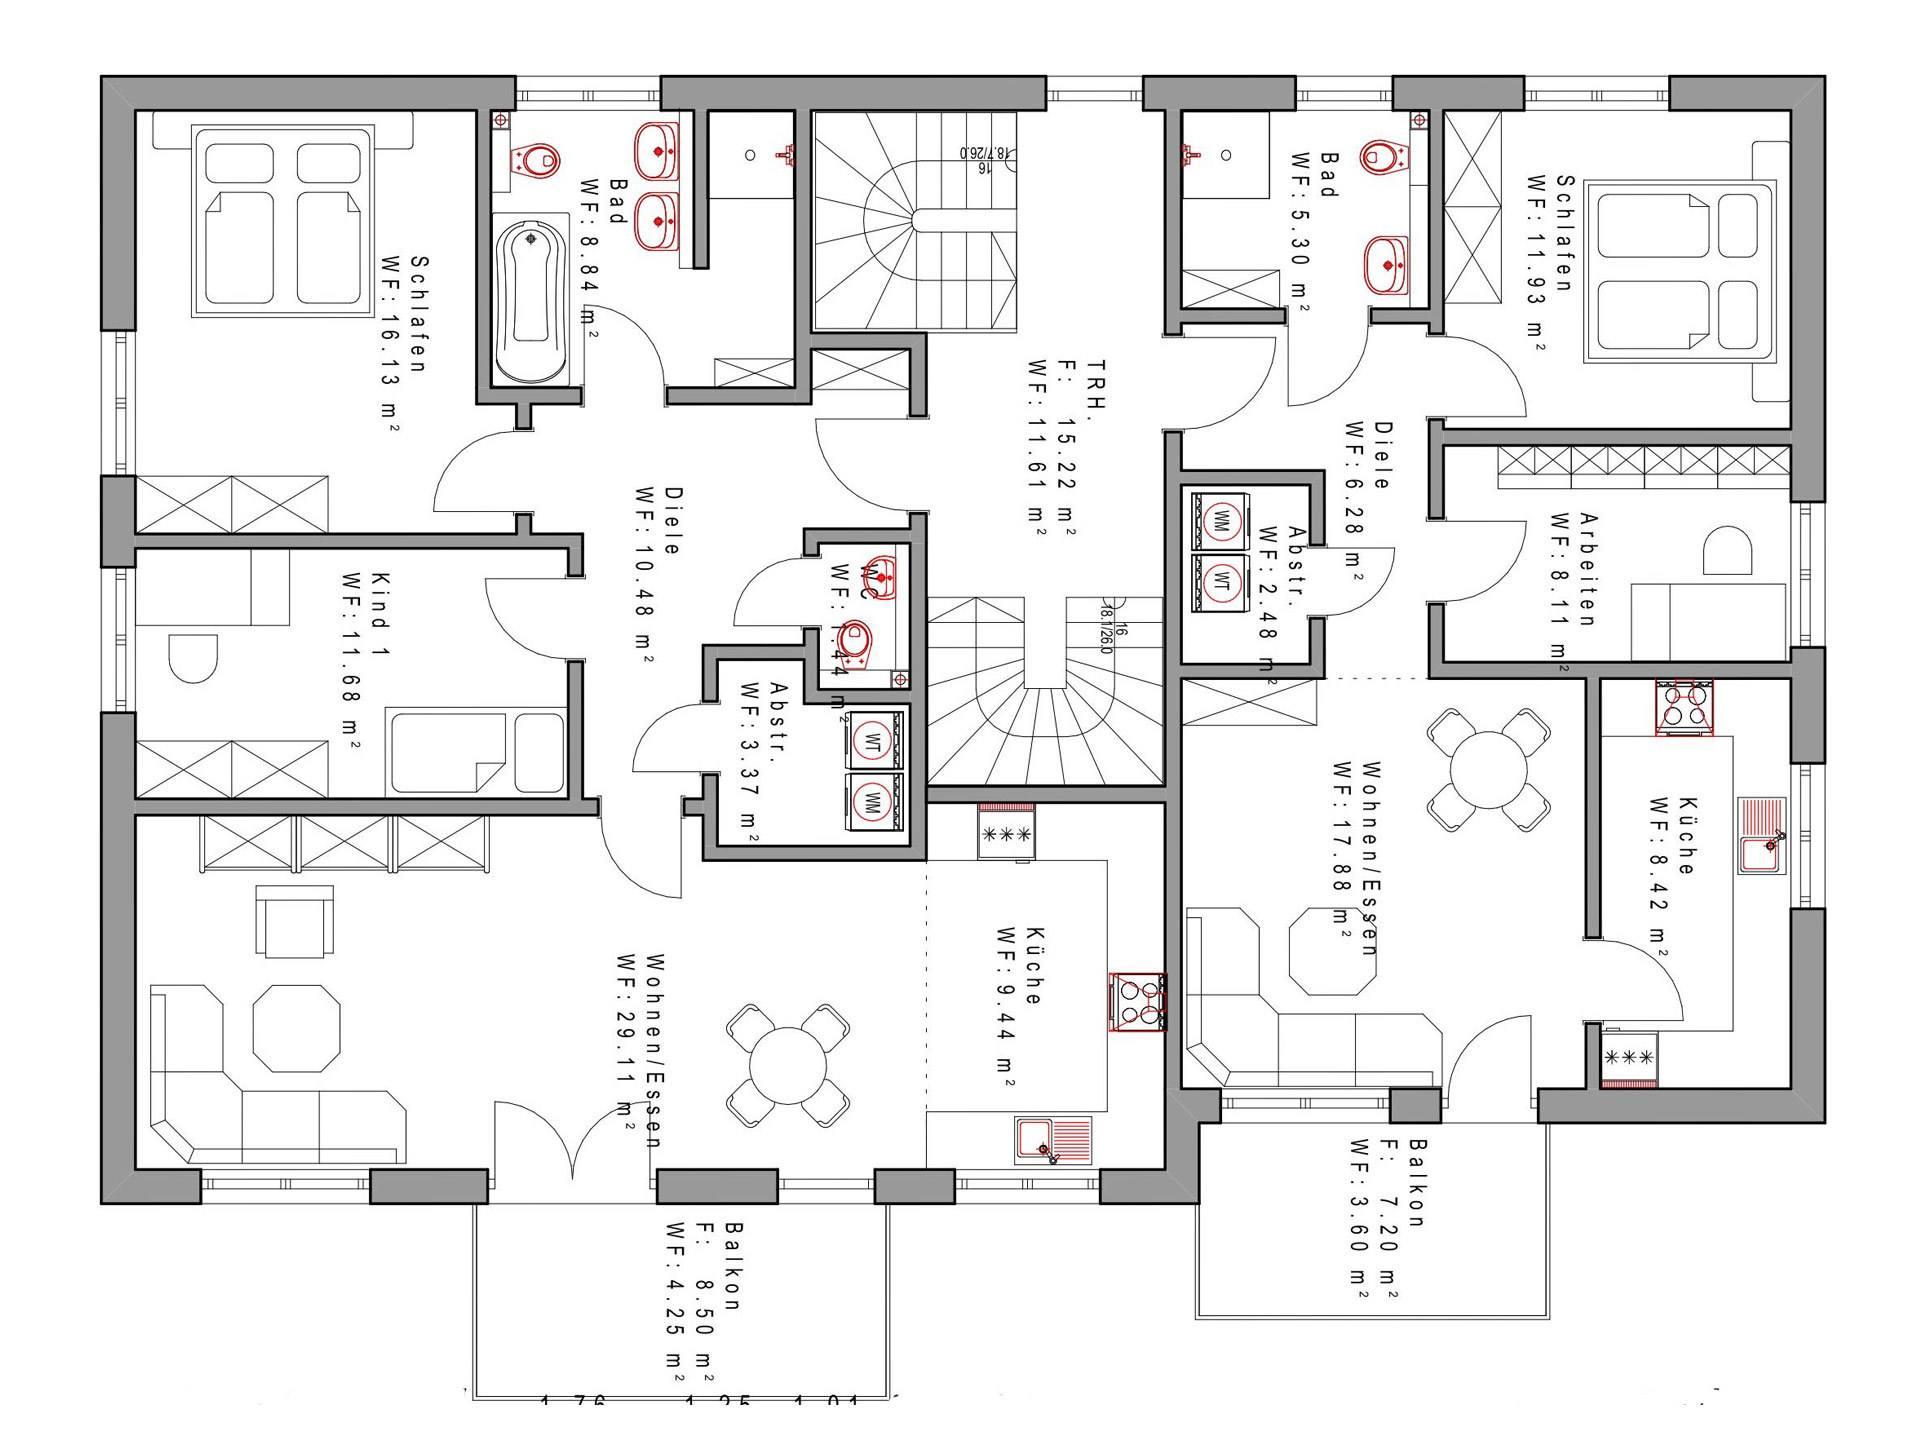 Vierfamilienhaus sd338 sachsenheimer fertighaus for Muster grundrisse haus